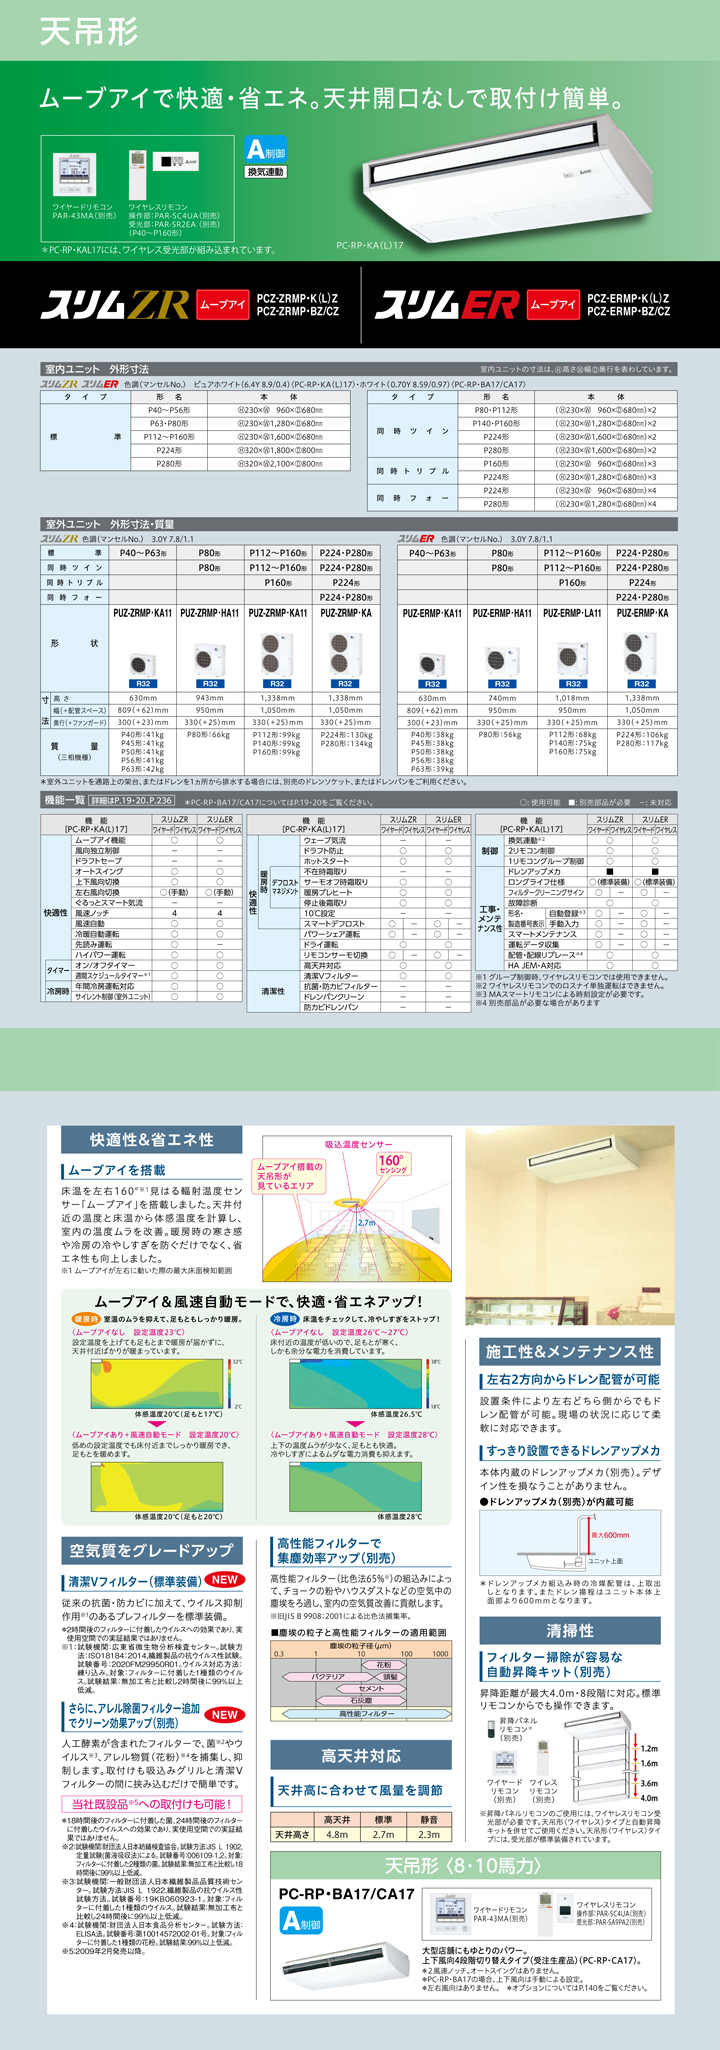 PCZ-ERMP112KLZカタログ